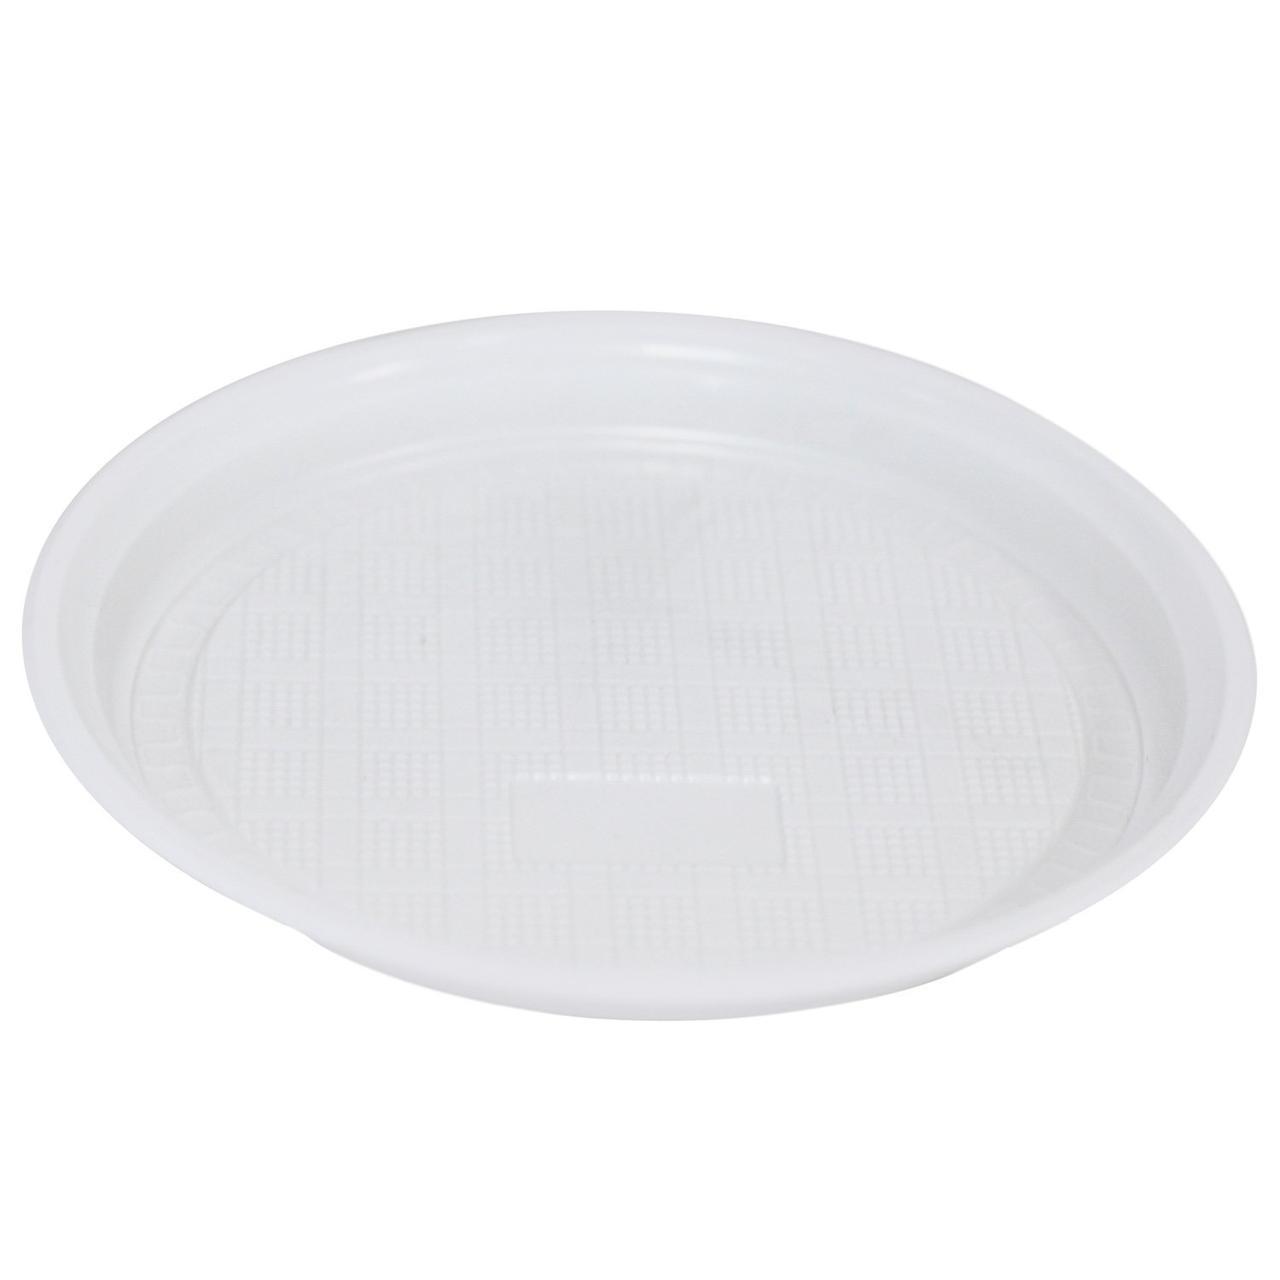 Тарелка d 205мм, бел., ПП, 2000 шт